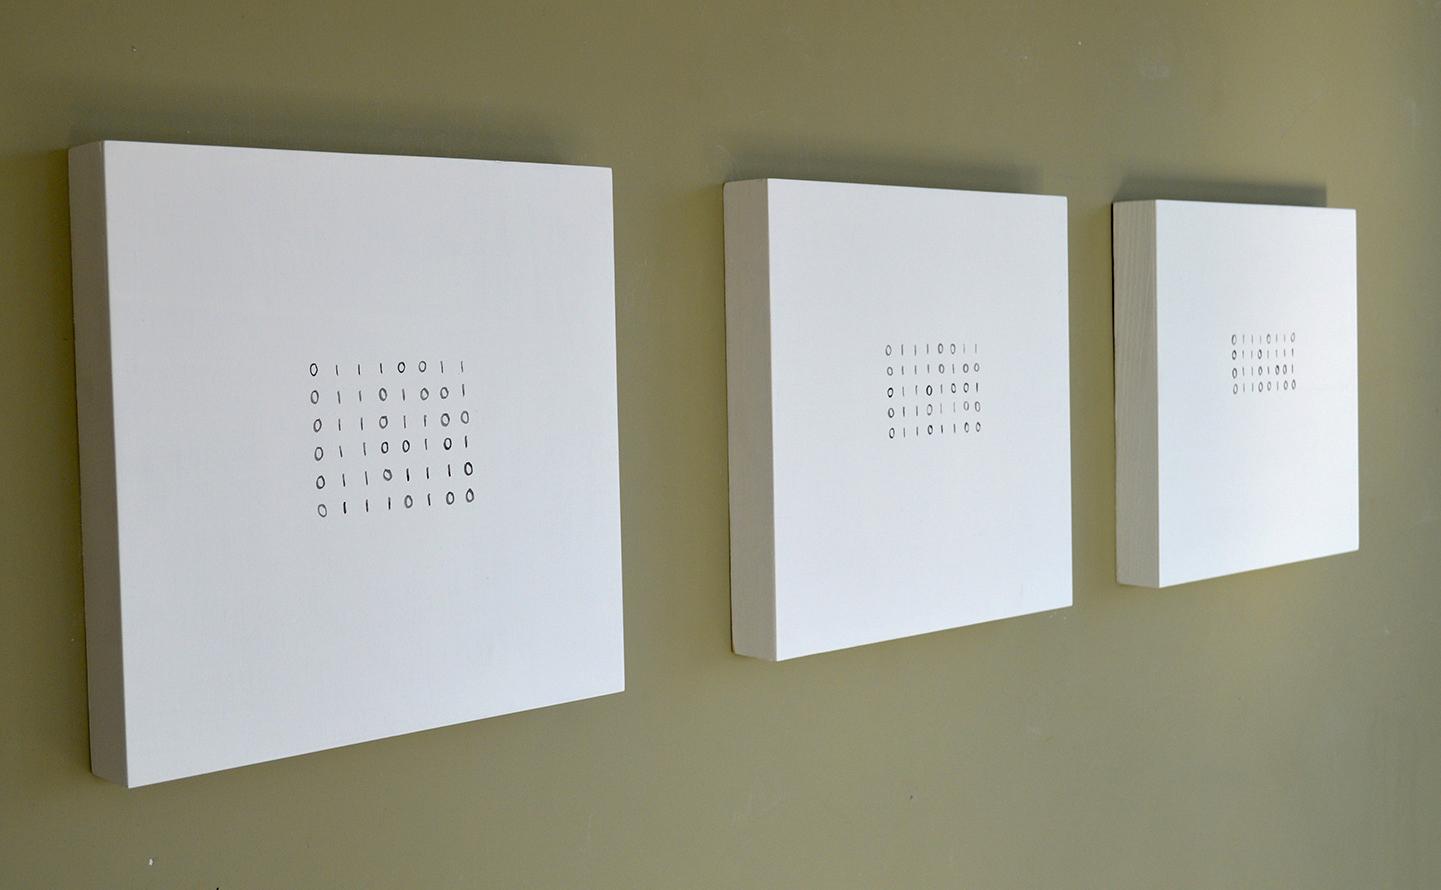 installation view, silent / still / void (left to right)